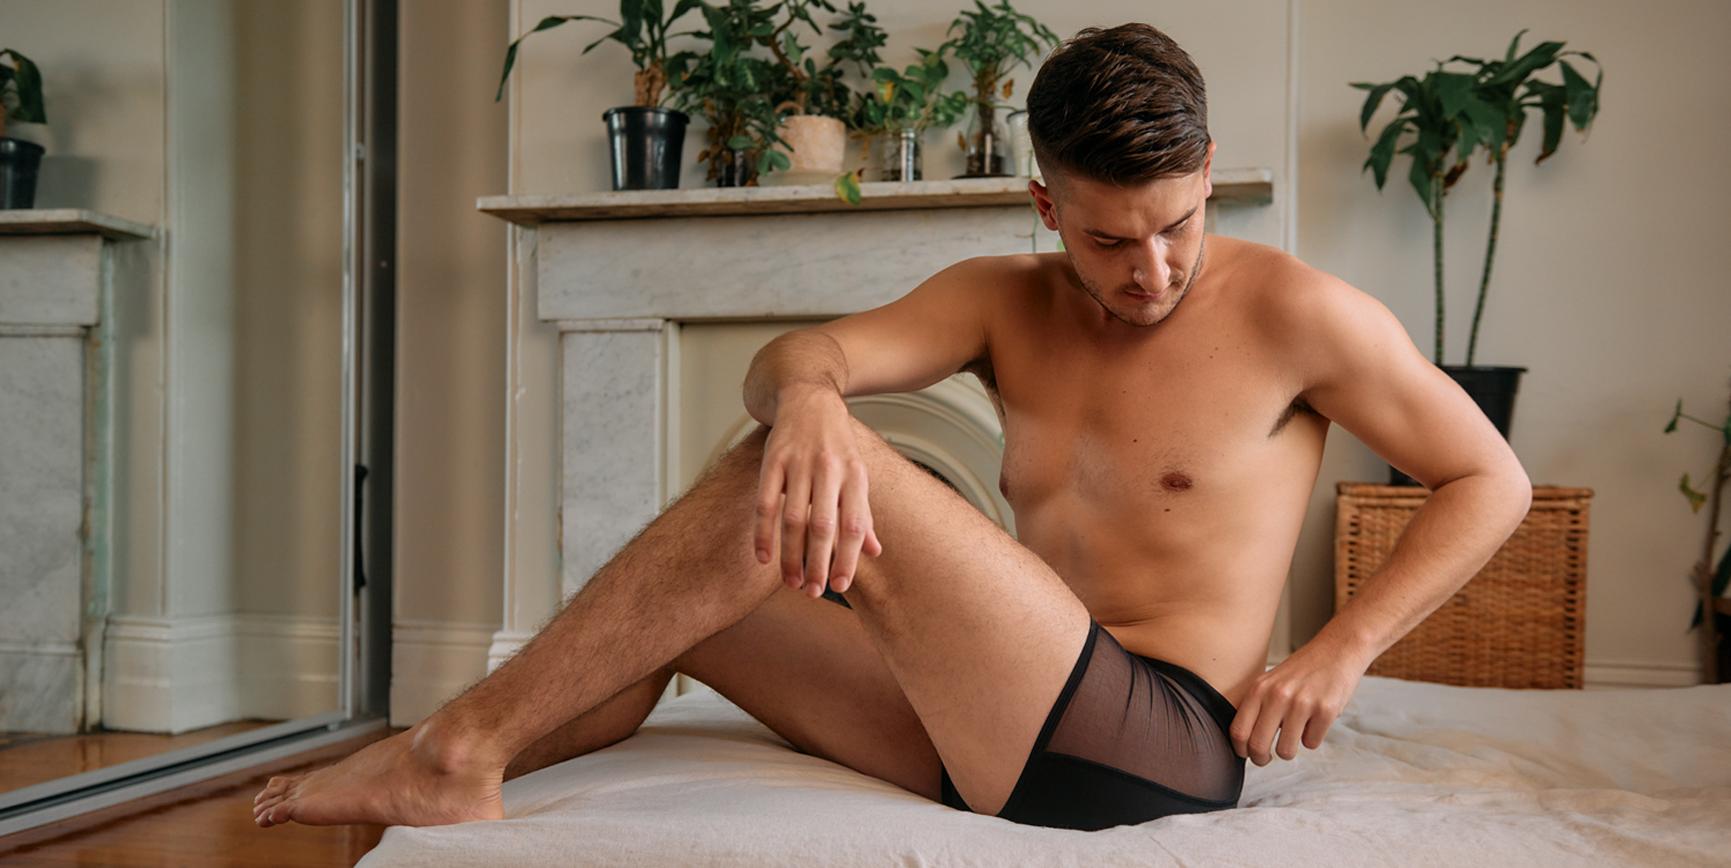 Man sitting on bed wearing lingerie for men